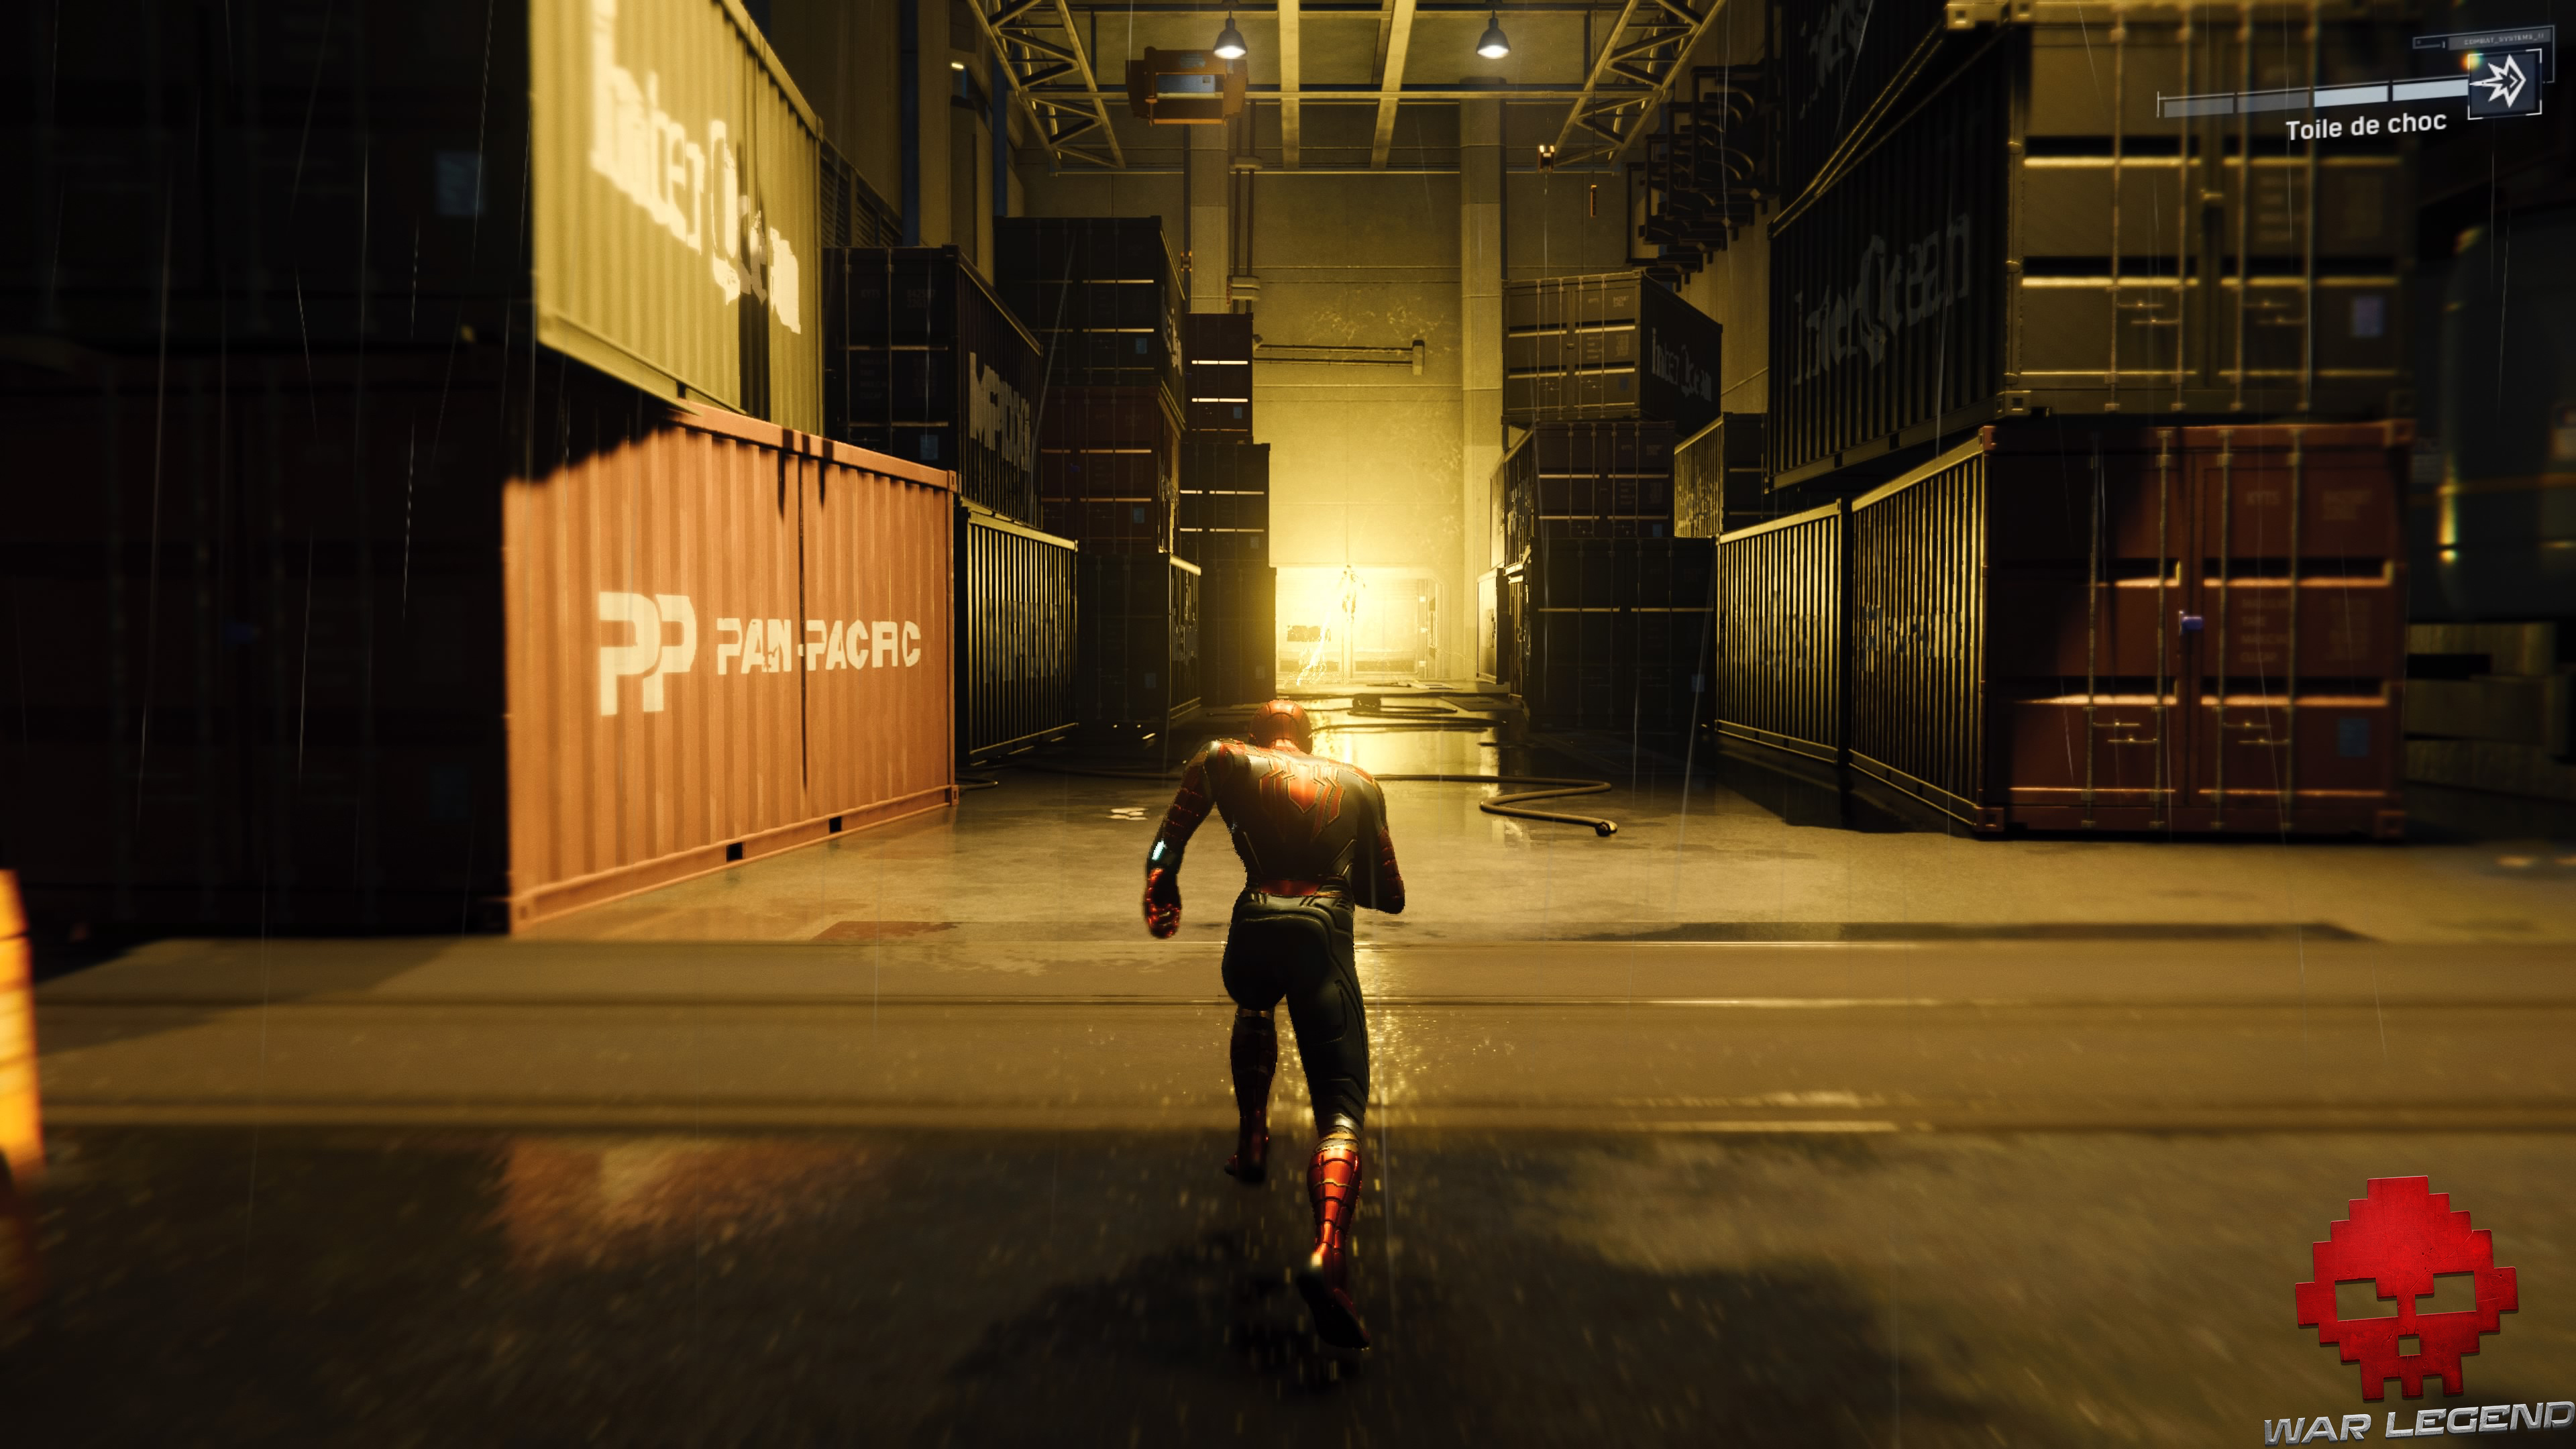 solution spider-man réflexion - Electro dans un hangar